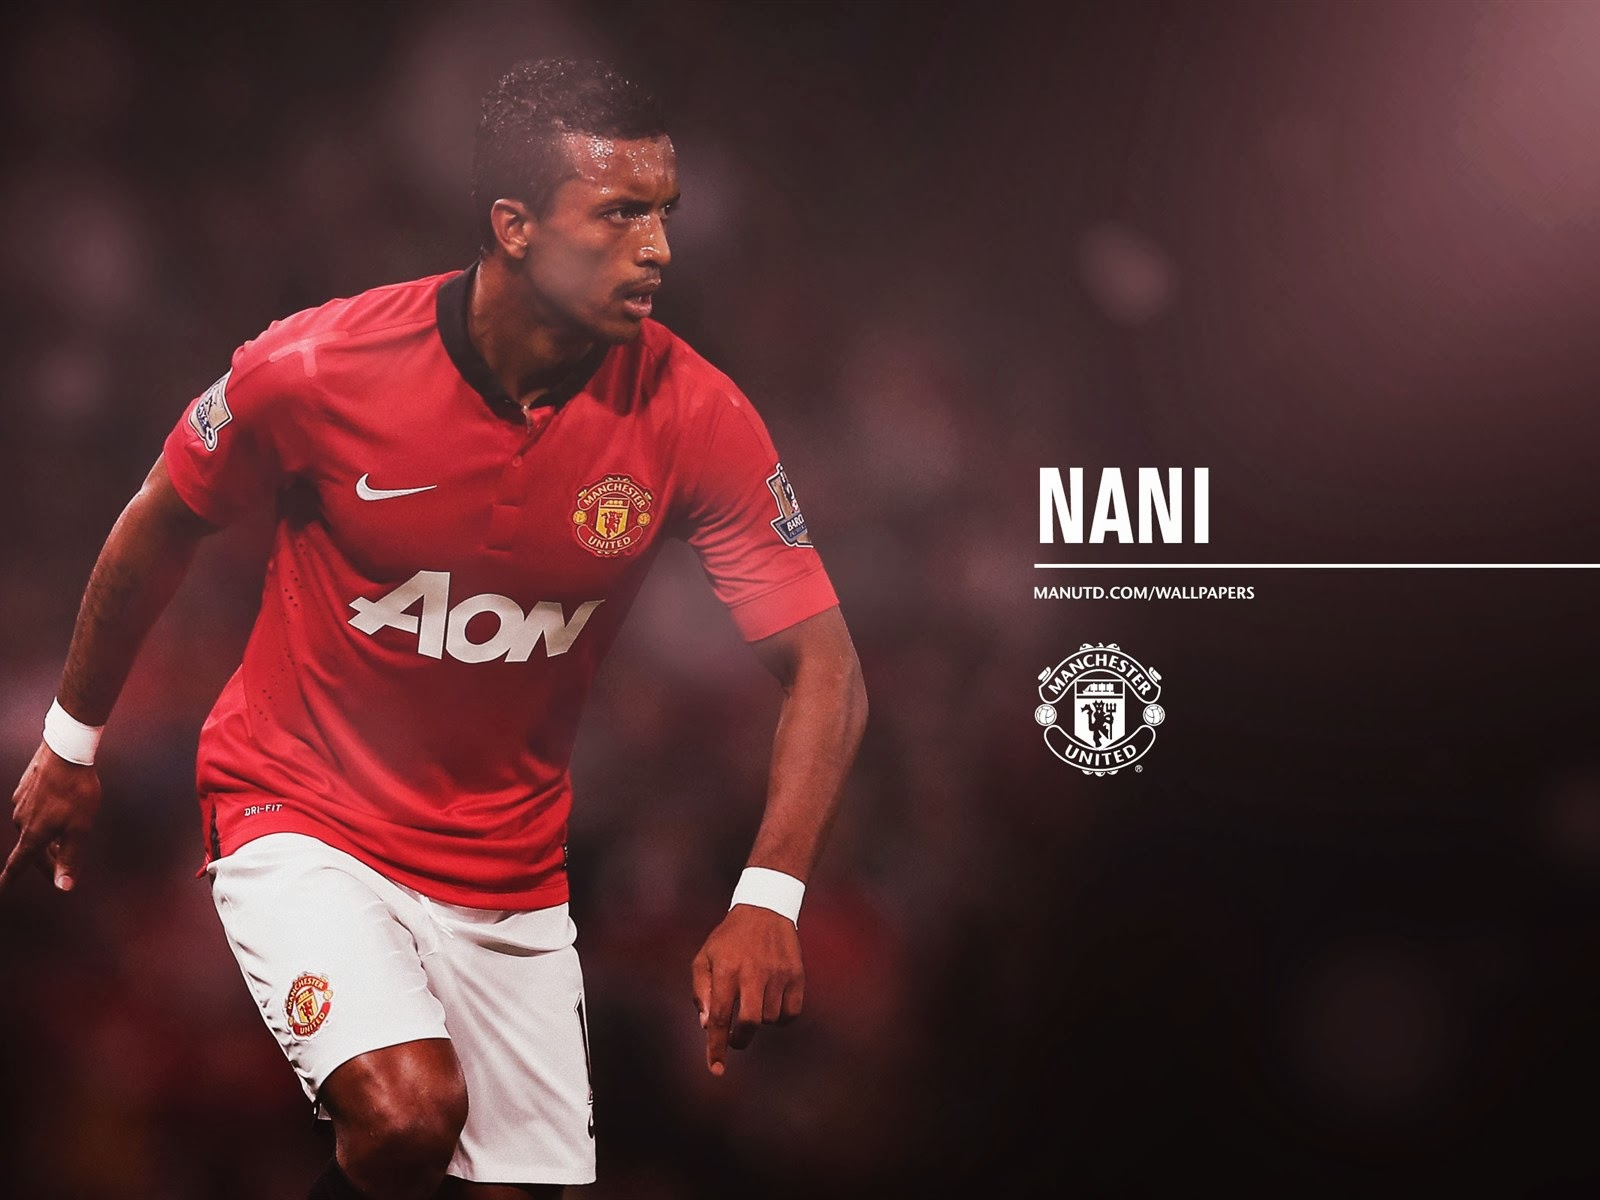 Manchester United Daftar Pemain Skuad Manchester United